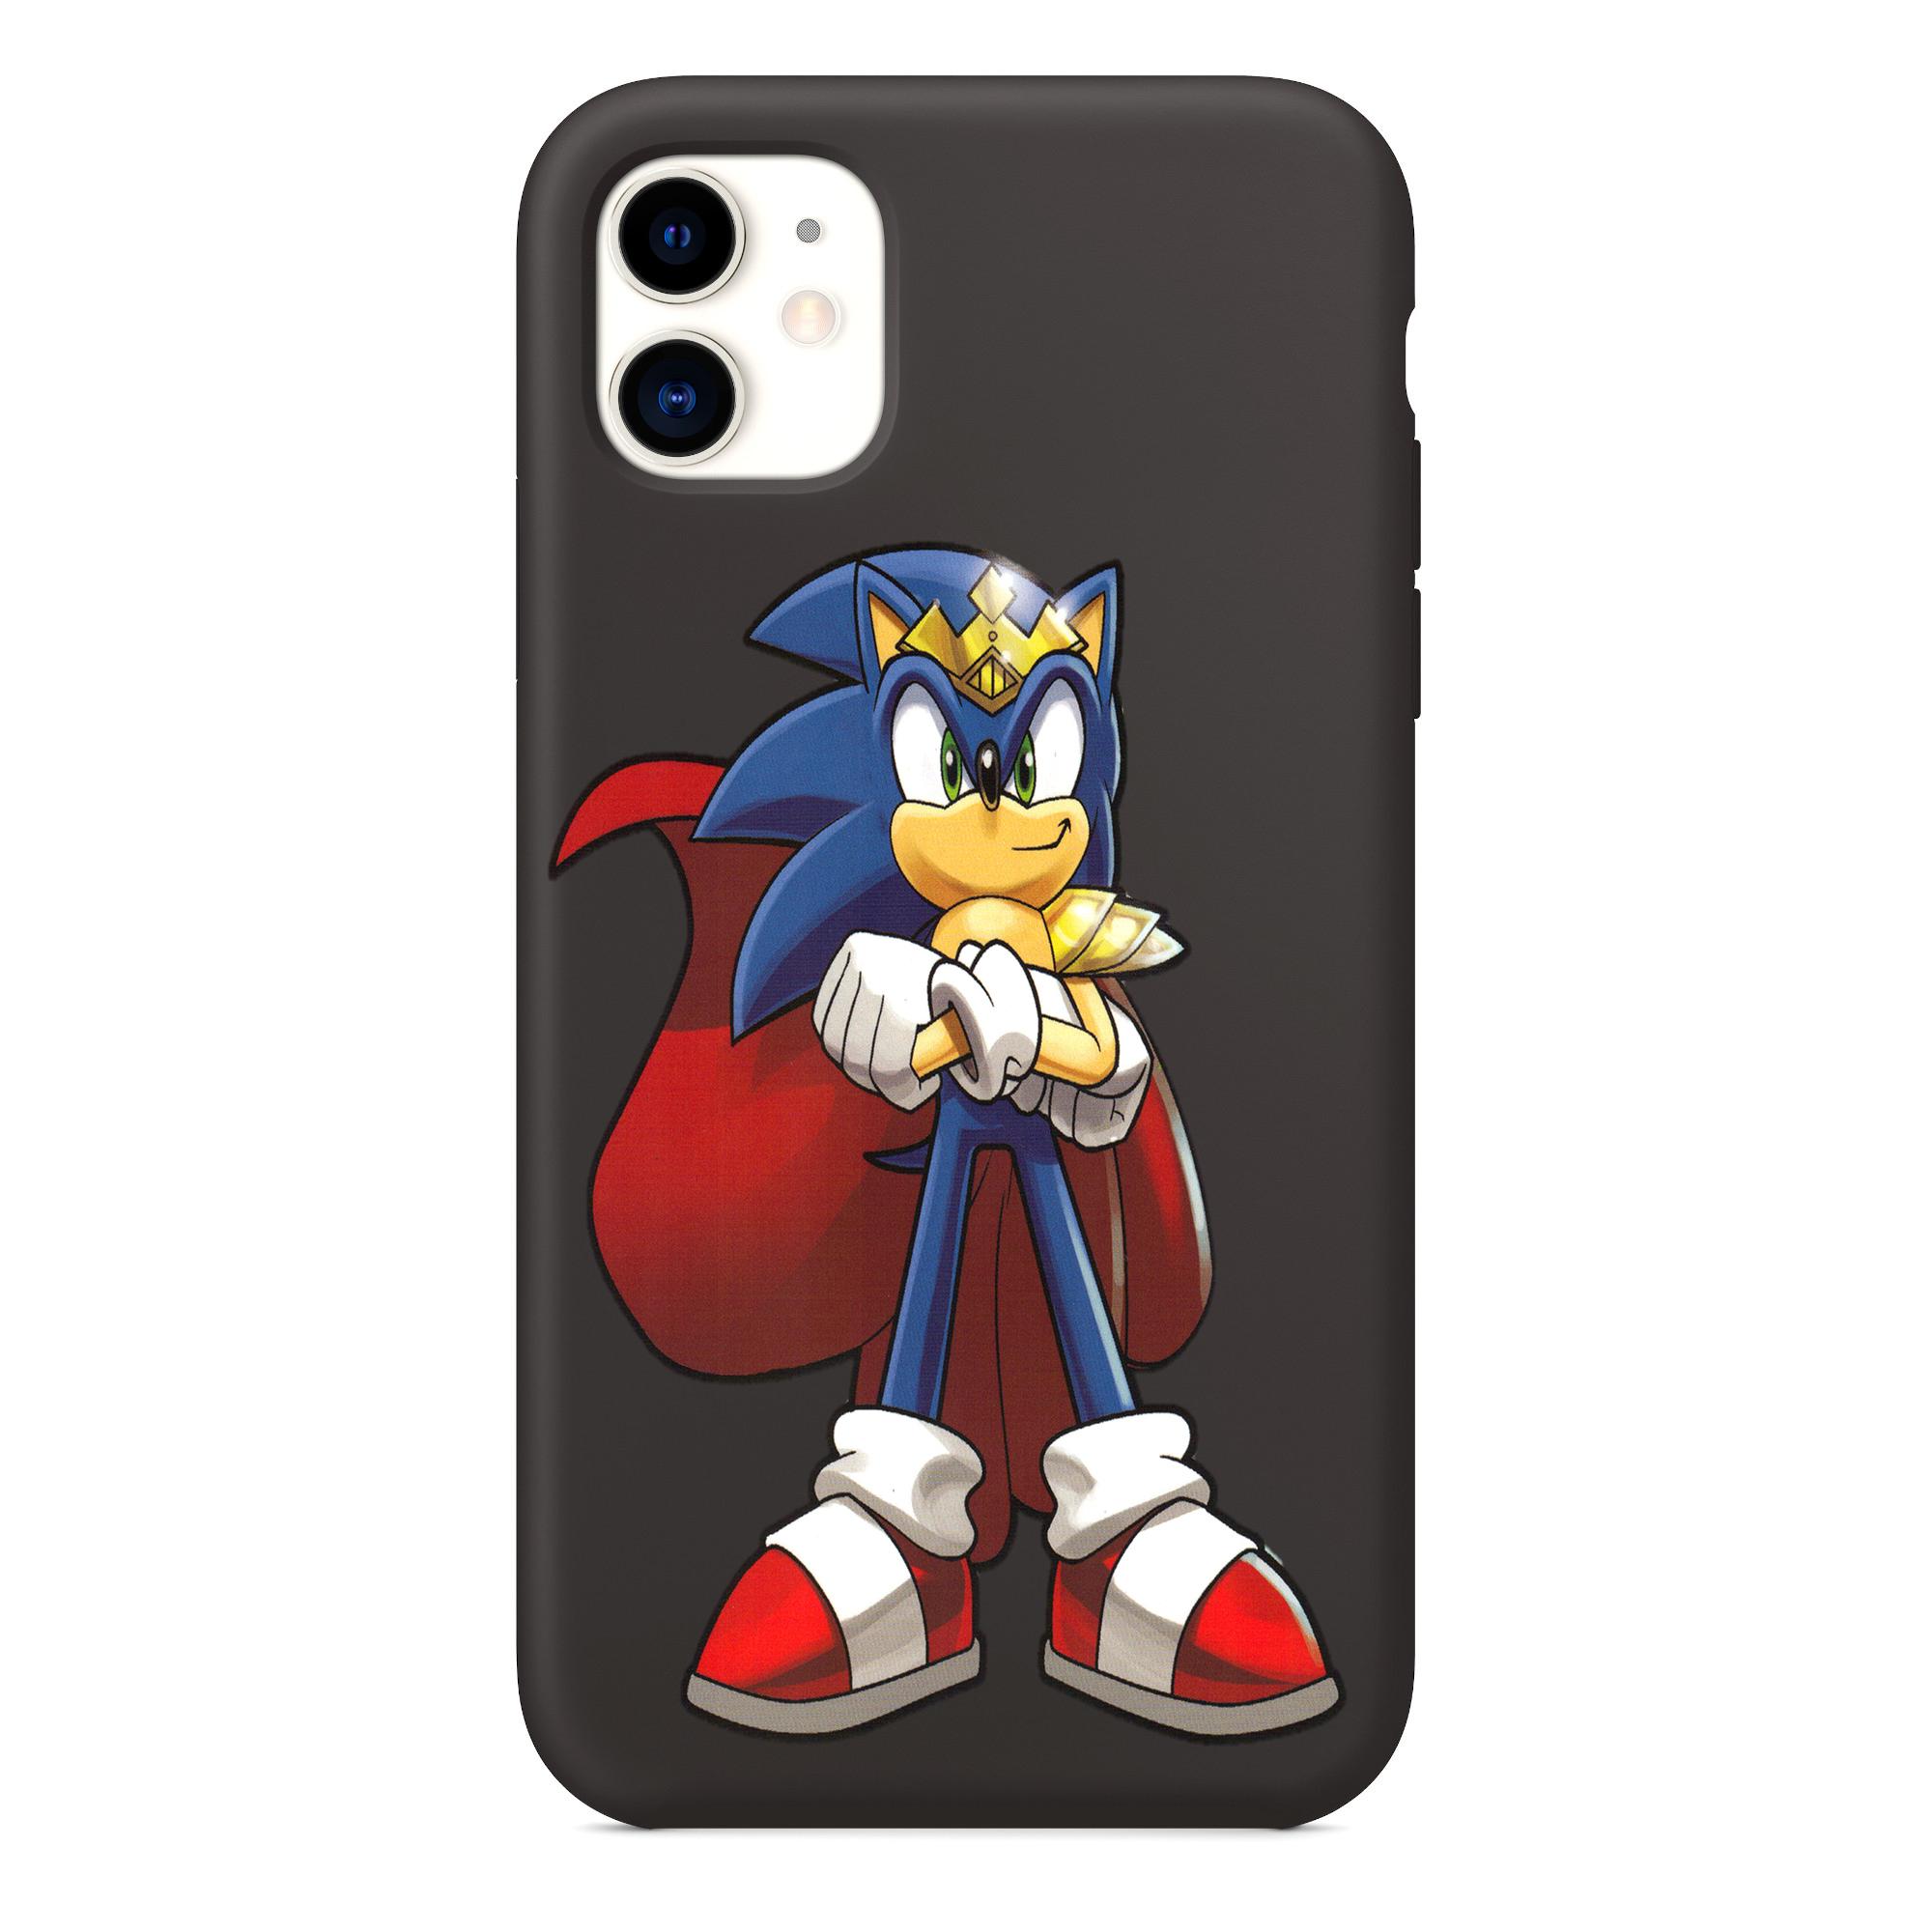 Custodia per iPhone Sonic X, custodia per telefono Sonic X per iPhone 11